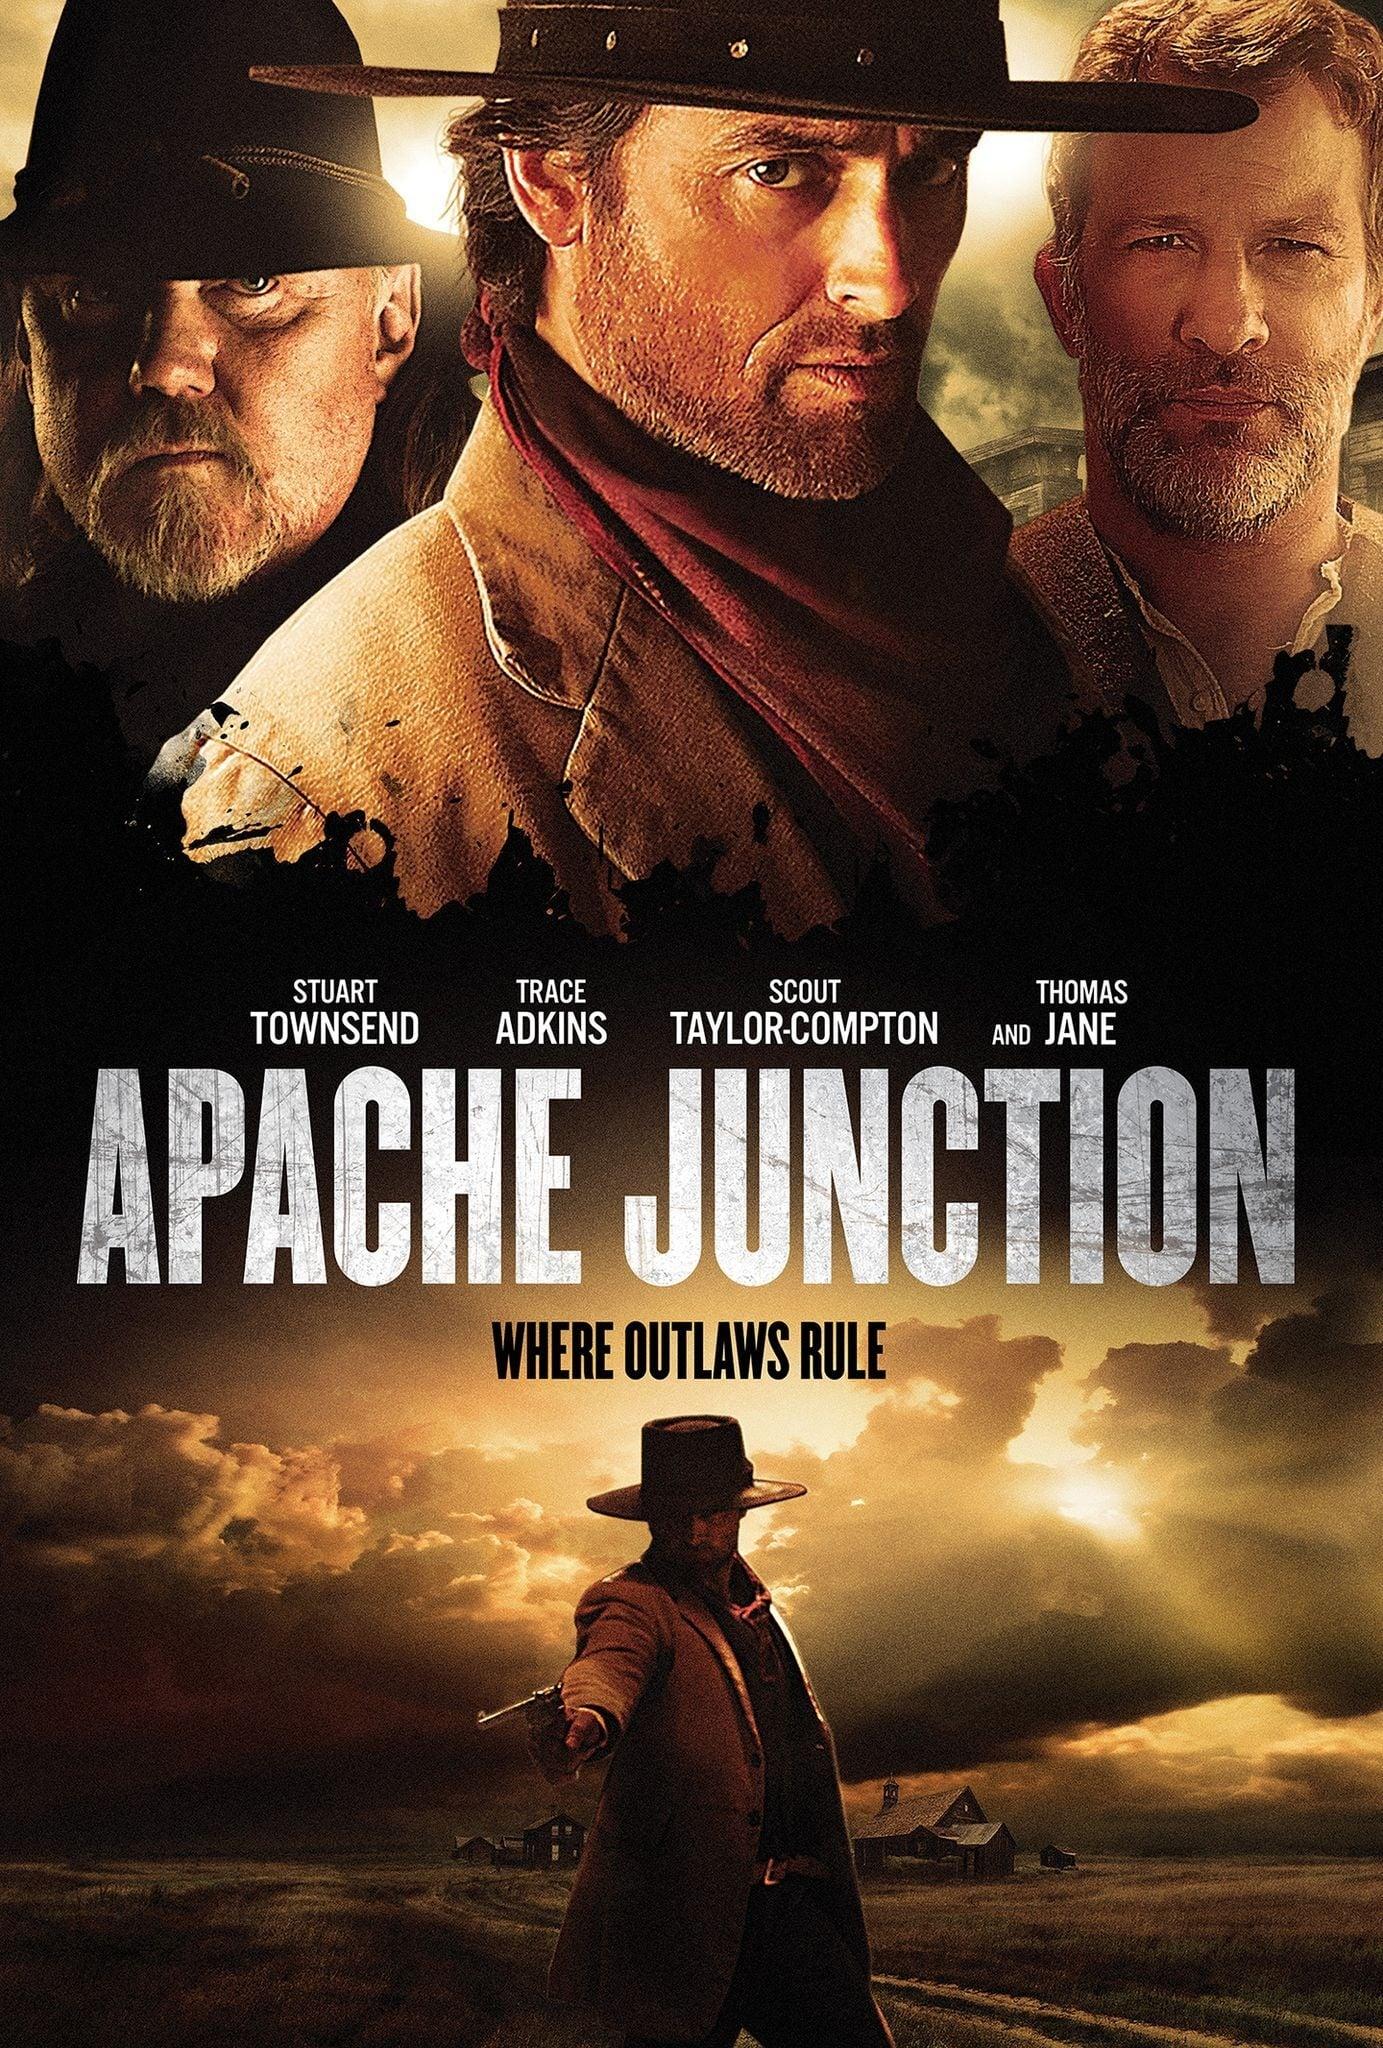 Download Filme Apache Junction Qualidade Hd